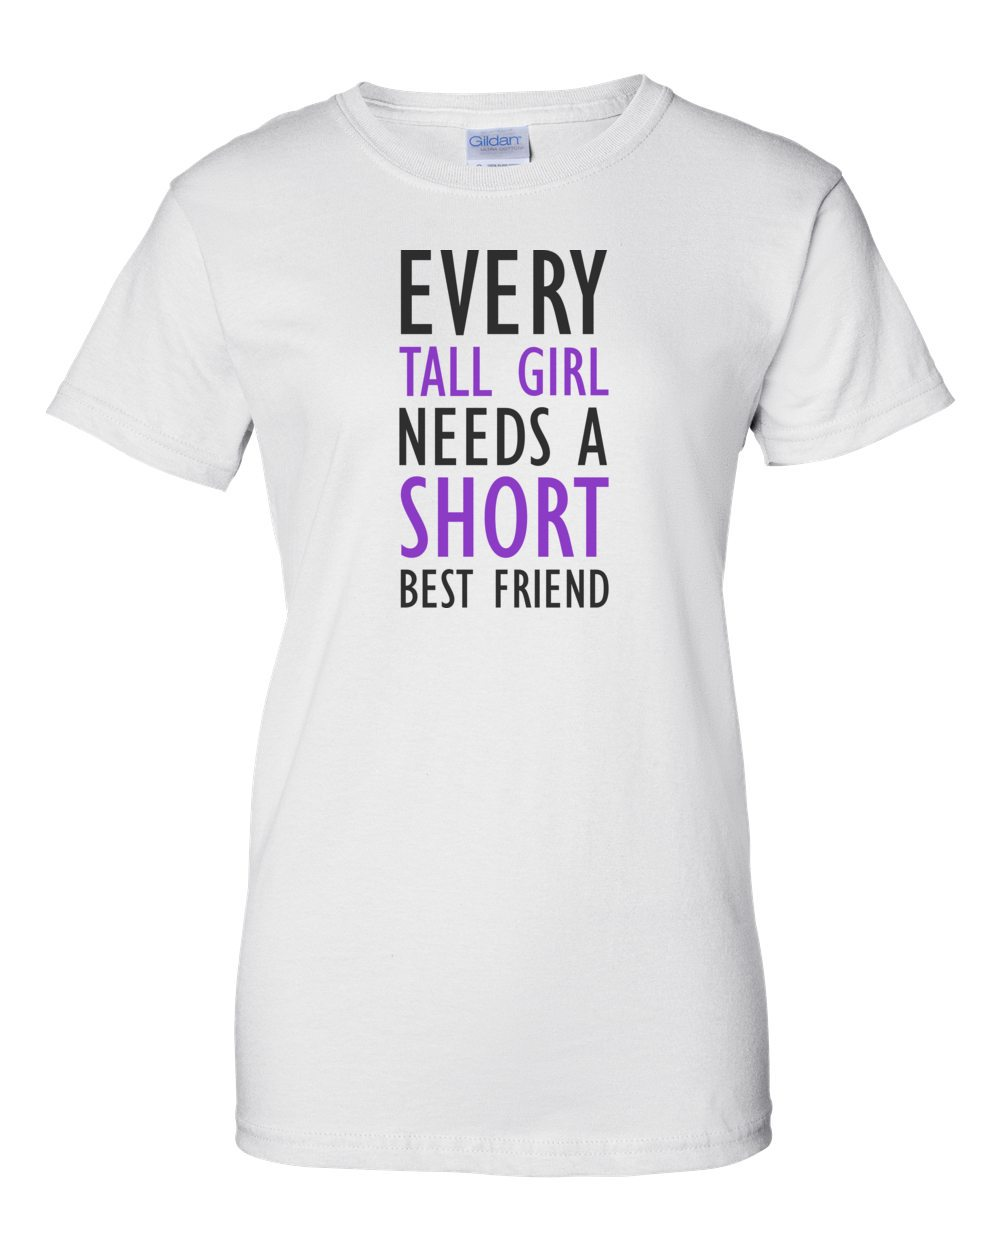 cb926680f Every tall girl needs a shirt best friend - funny ladies t-shirt